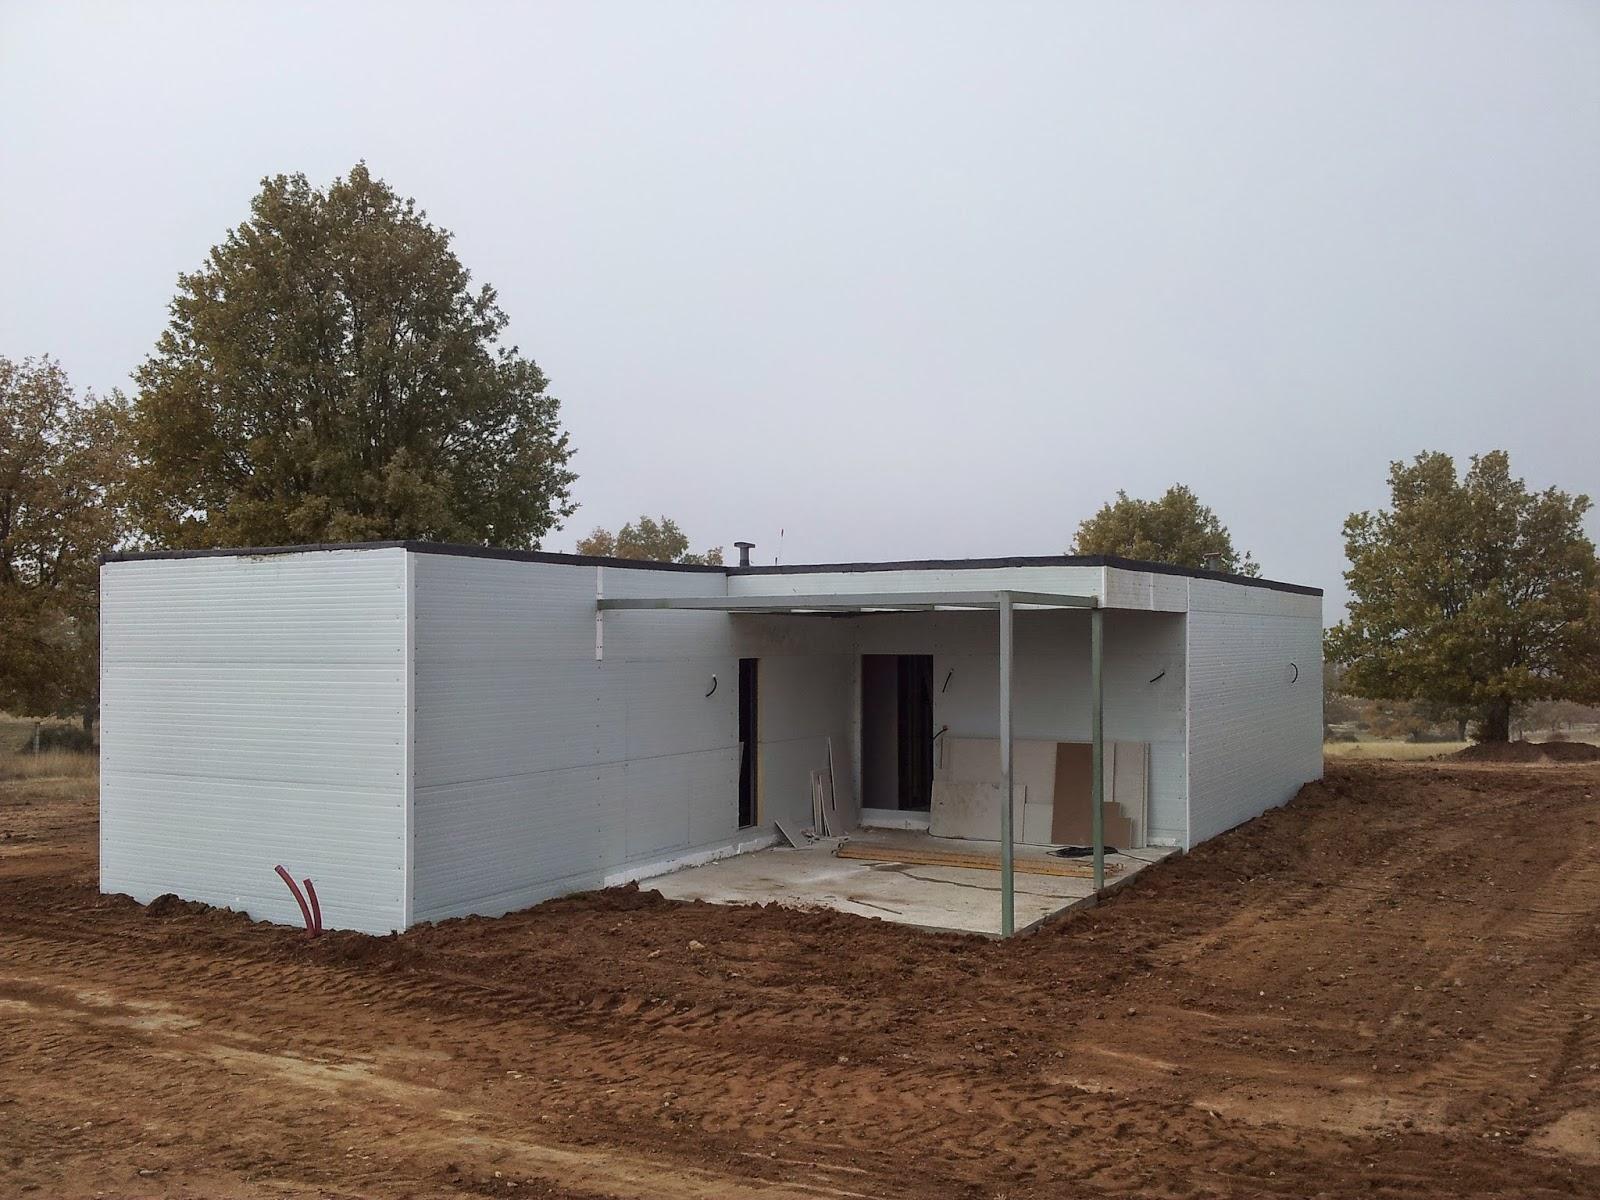 Panel s ndwich seguridad y aislamiento para viviendas modulares resan modular - Casas de panel sandwich ...